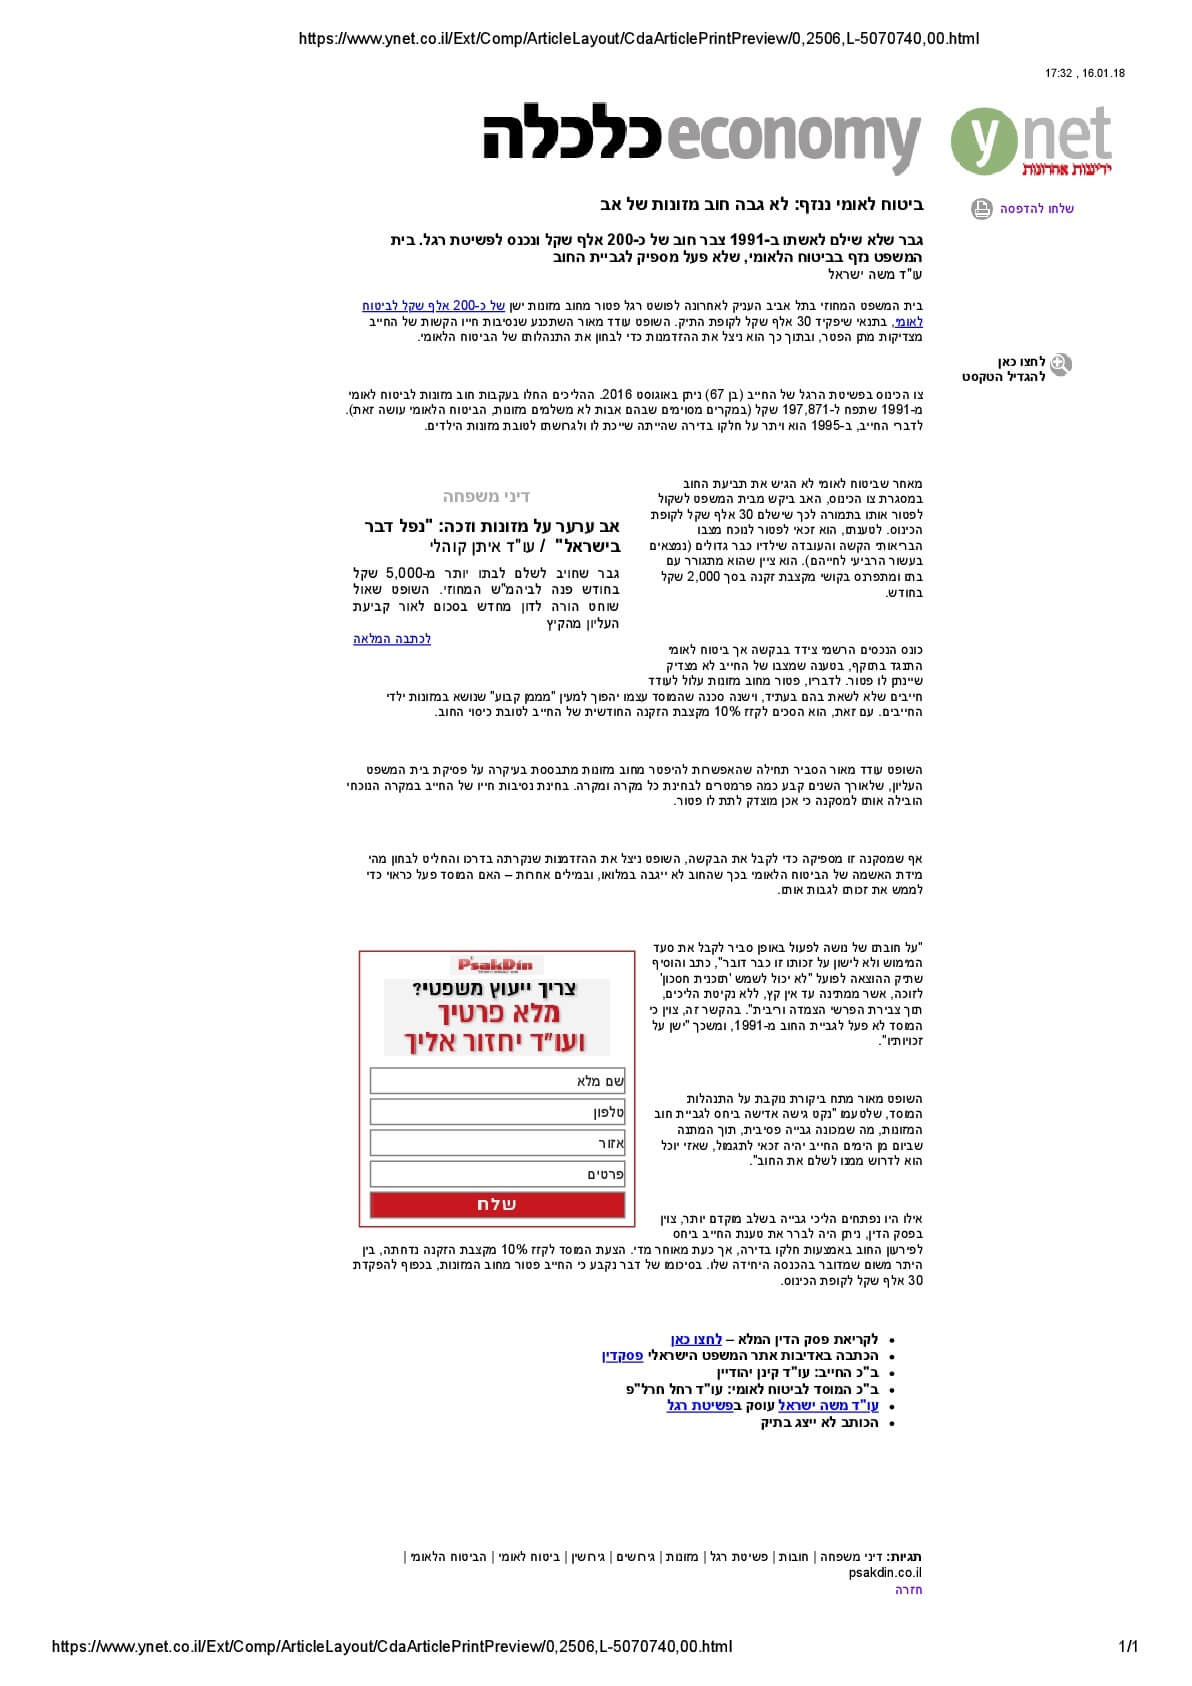 YNET - ביטוח לאומי ננזף - לא גבה חוב מזונות של אב - עורך דין משה ישראל